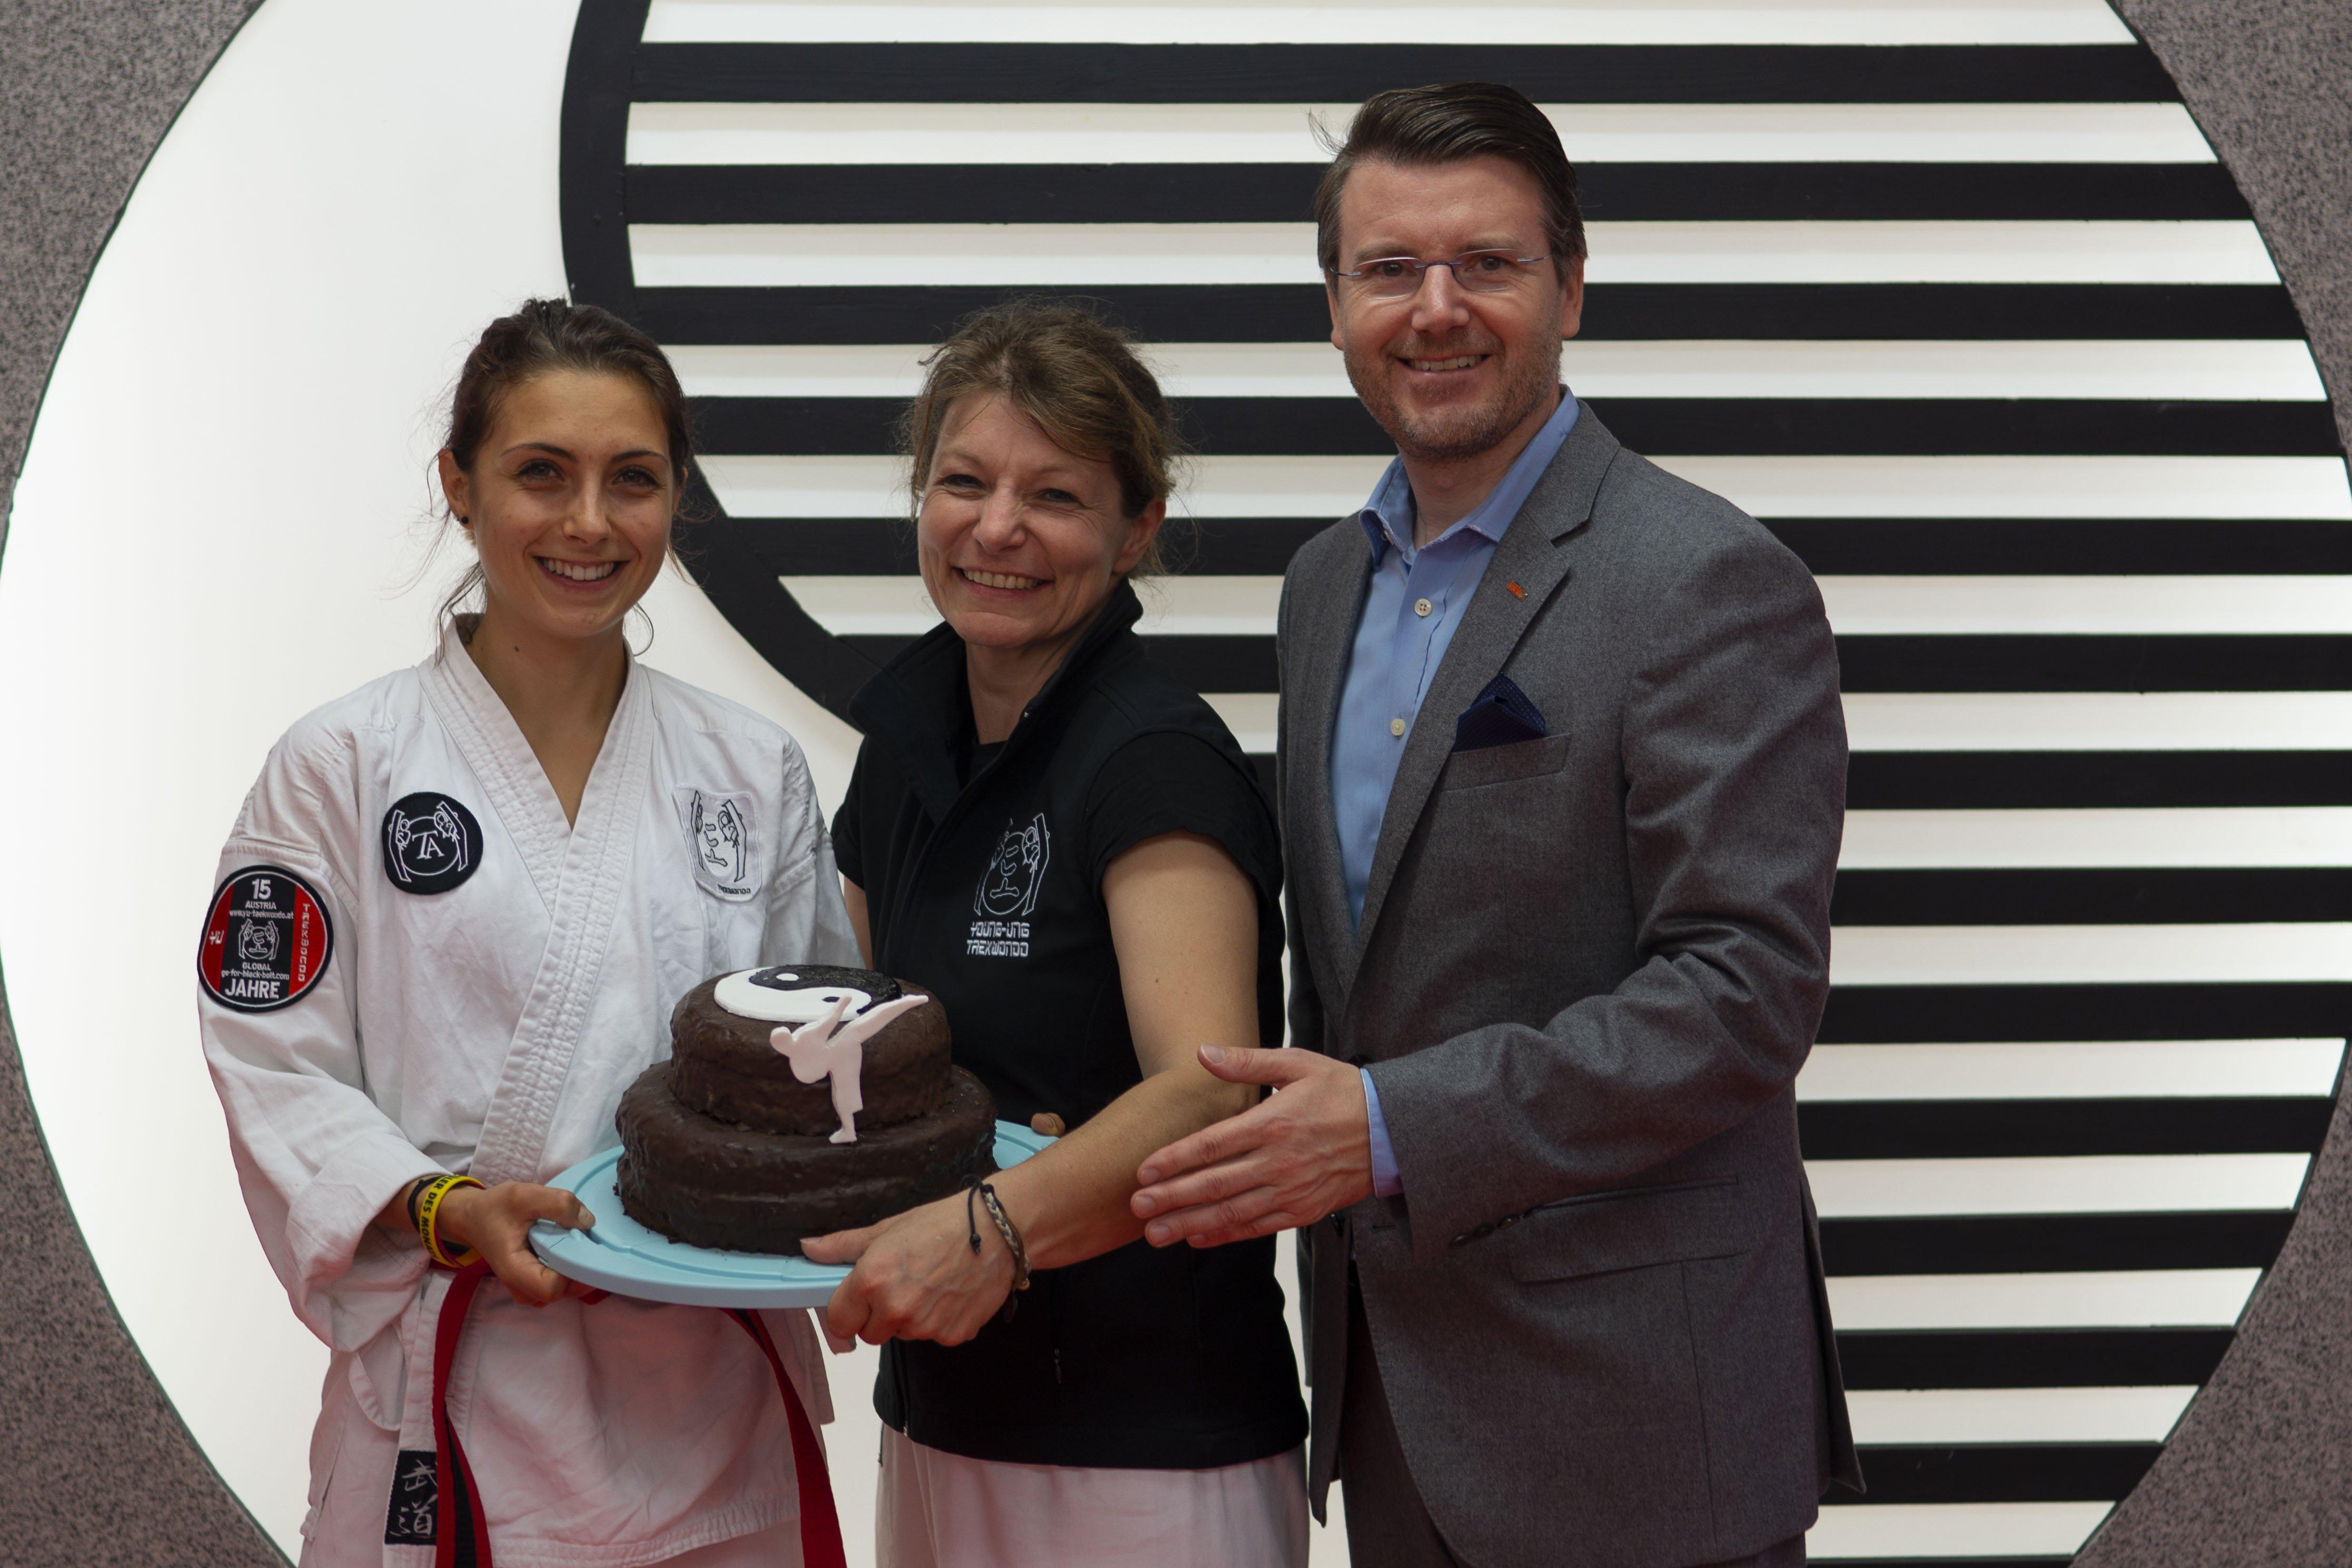 YOUNG-UNG Taekwondo Kampfsport Krems Training Eröffnung Wirtschaftskammer Obmann Thomas Hagmann